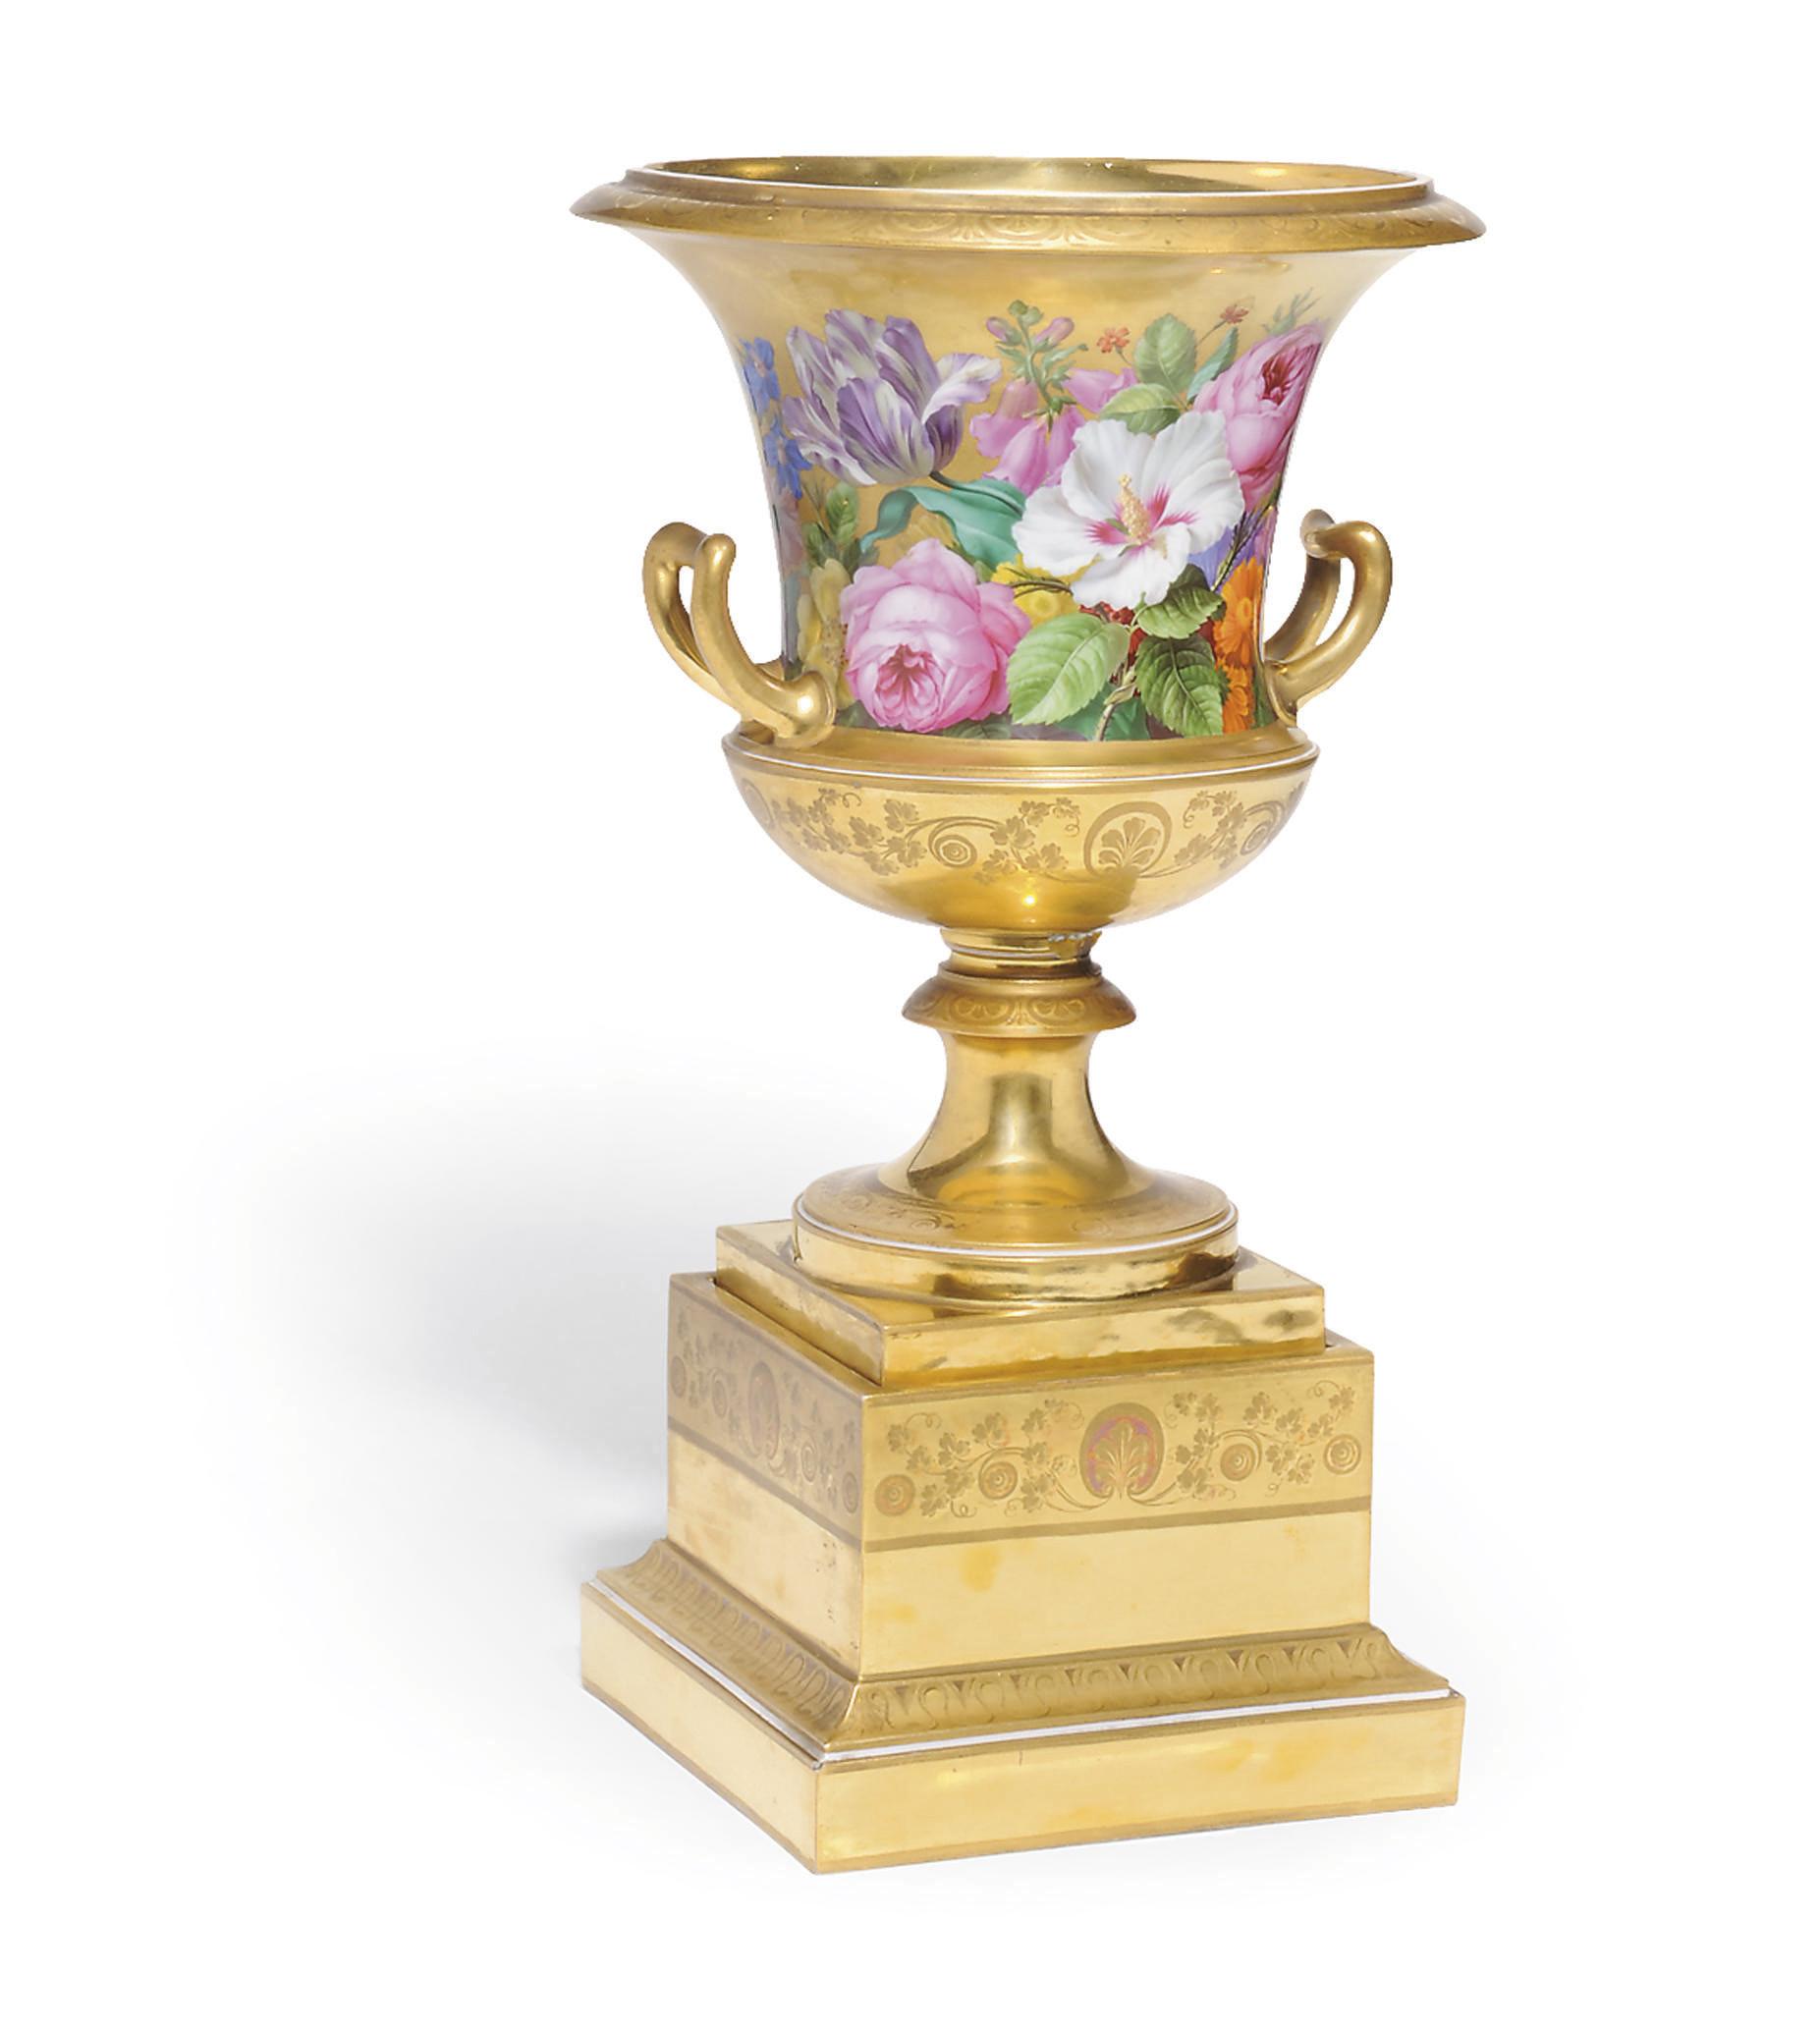 A VIENNA PORCELAIN GOLD-GROUND